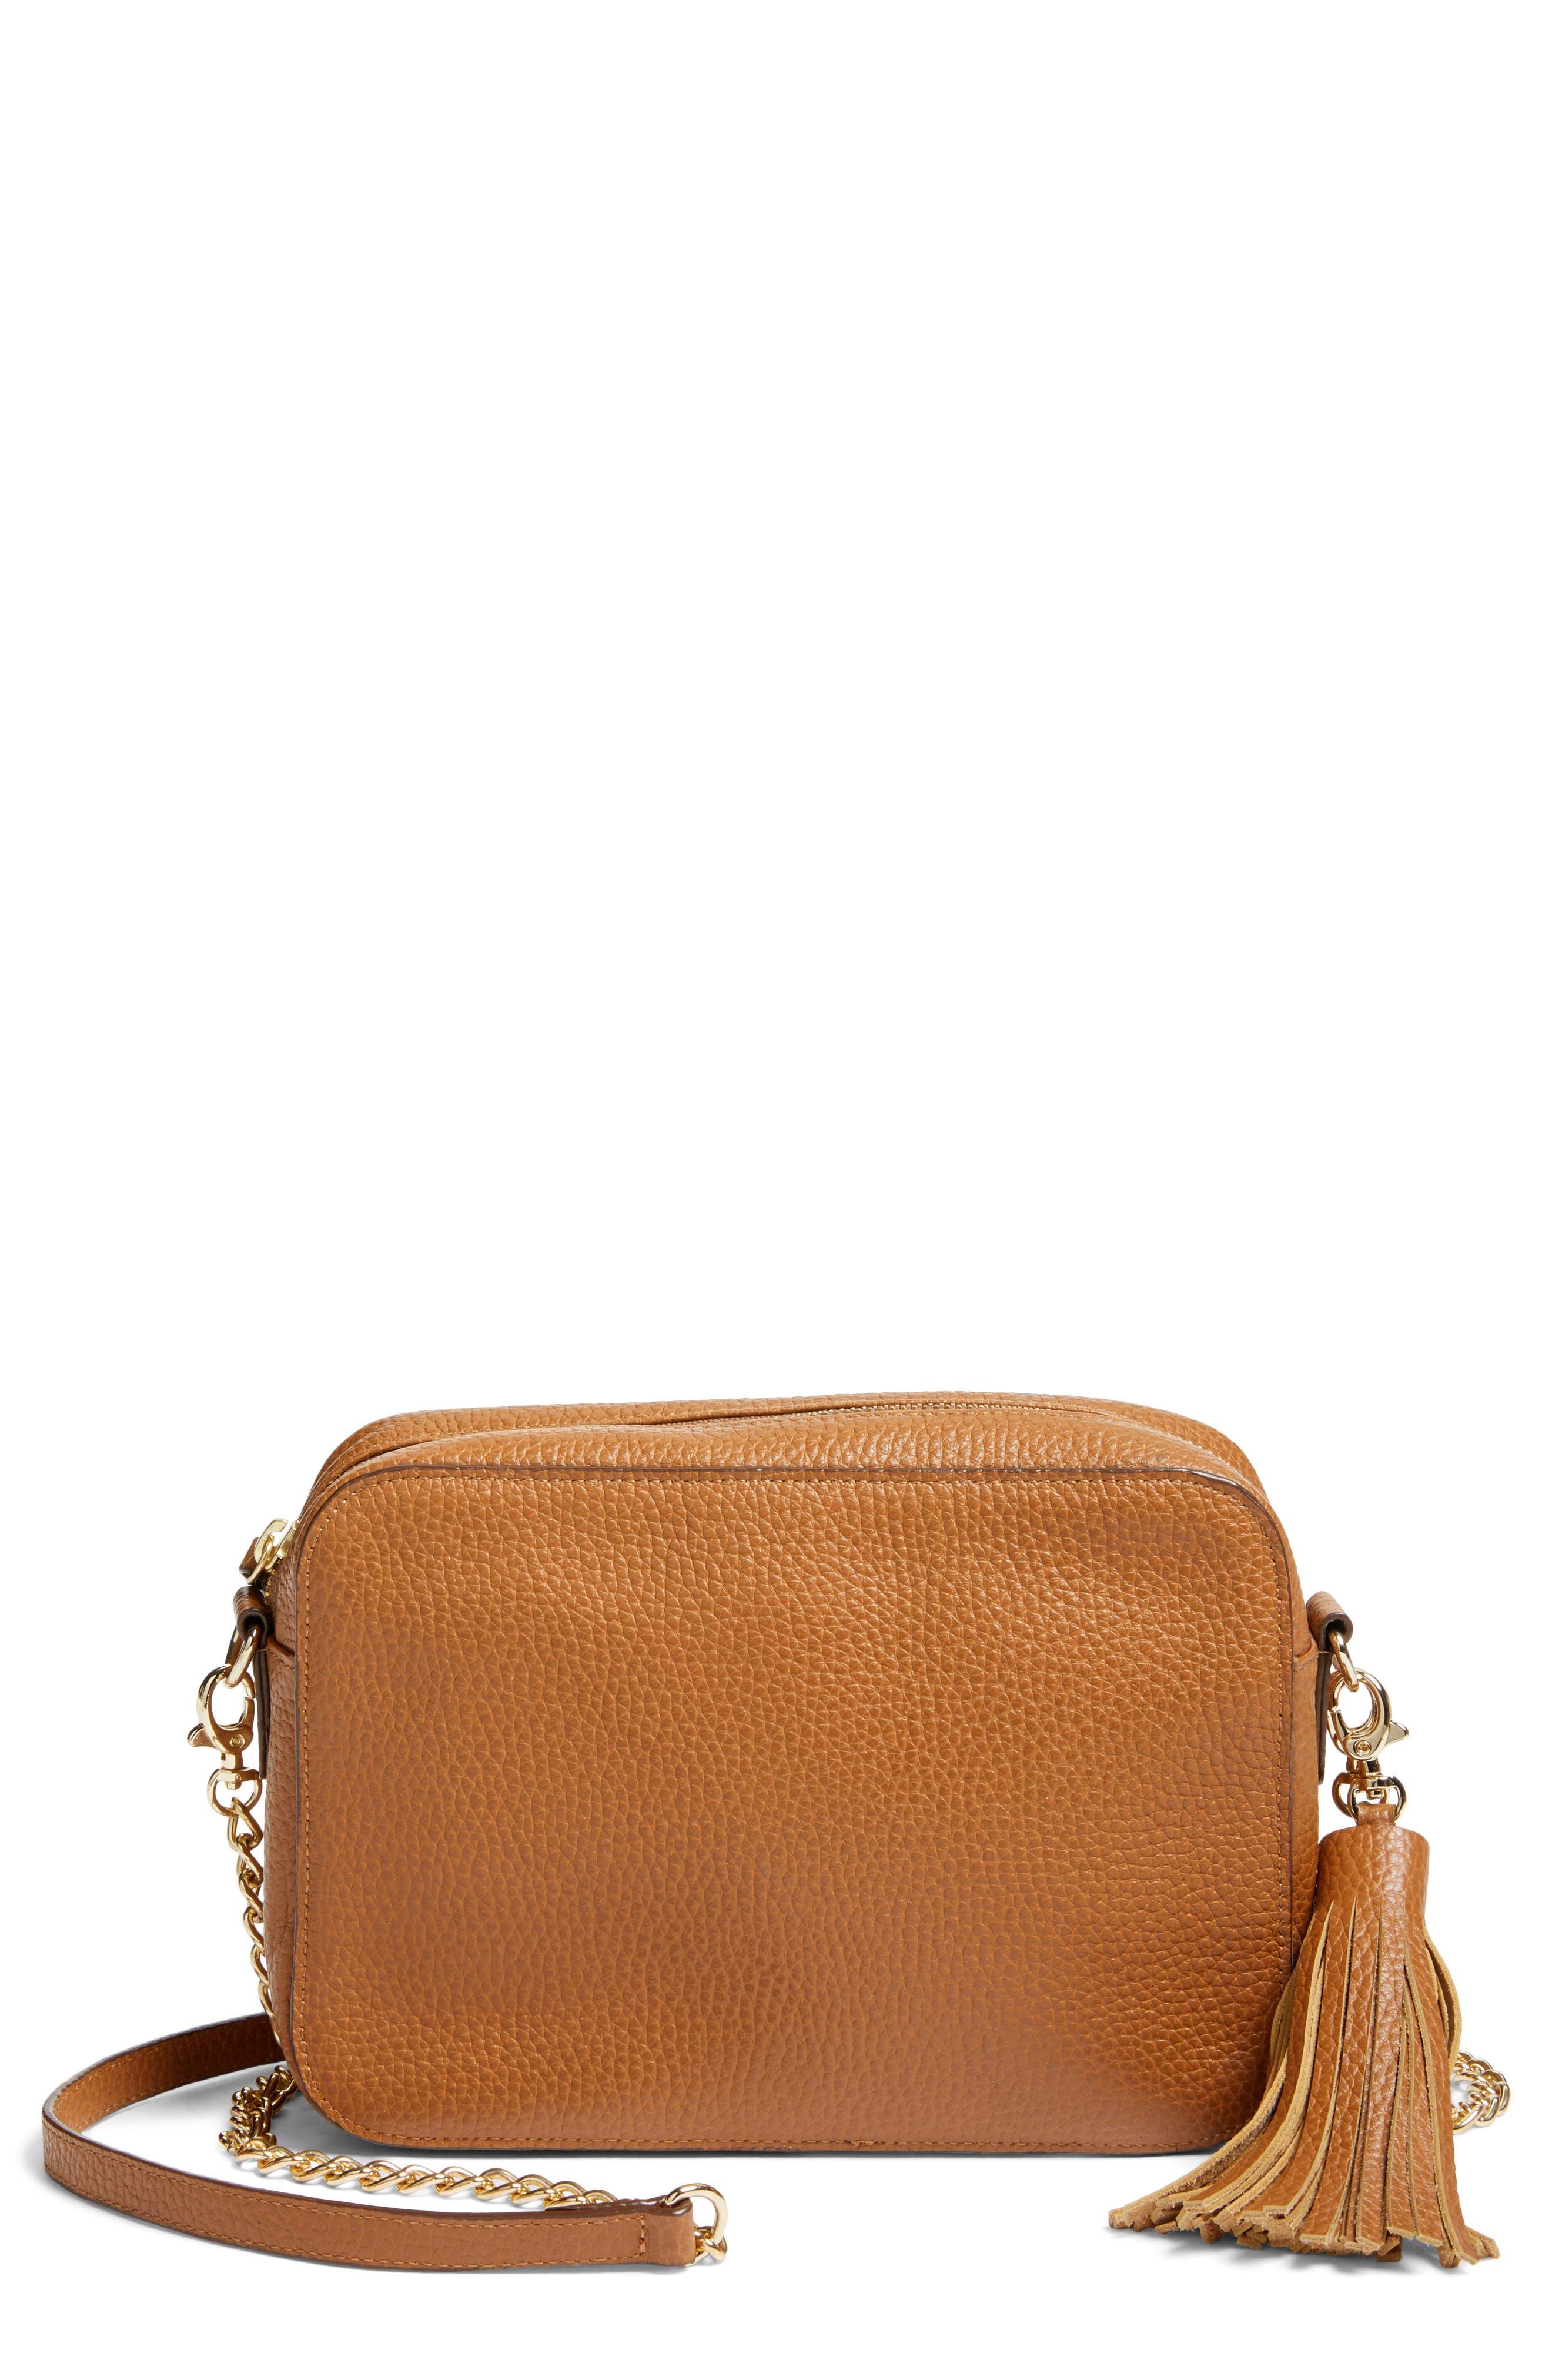 Ella Tassel Leather Crossbody Bag,                             Main thumbnail 1, color,                             Tan Spice